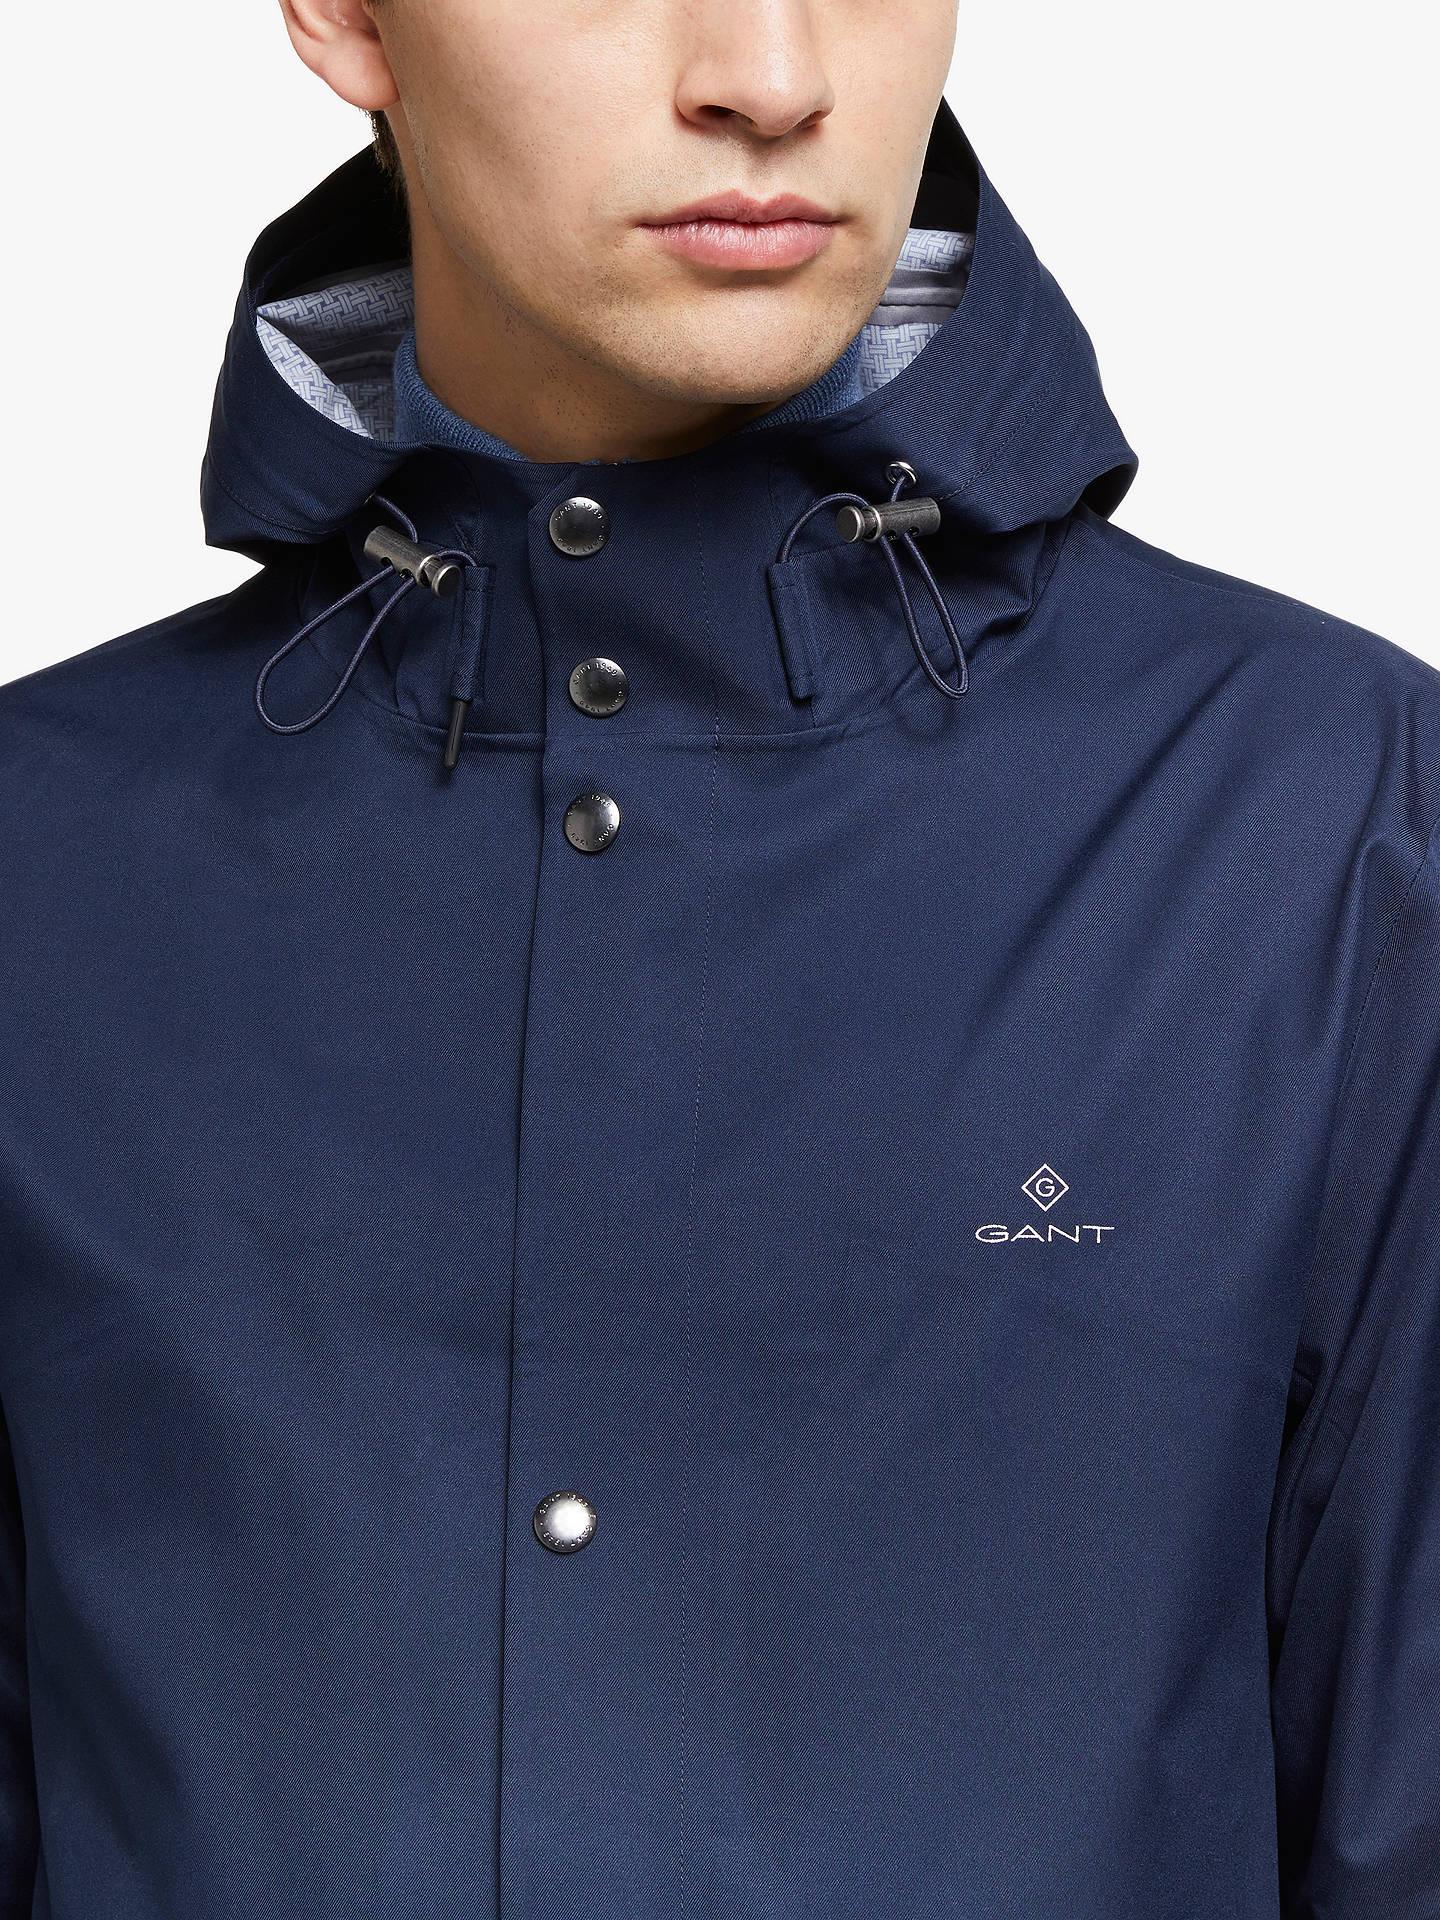 dd63e92e78c ... Buy GANT Mid Length Hooded Jacket, Marine, S Online at johnlewis.com ...